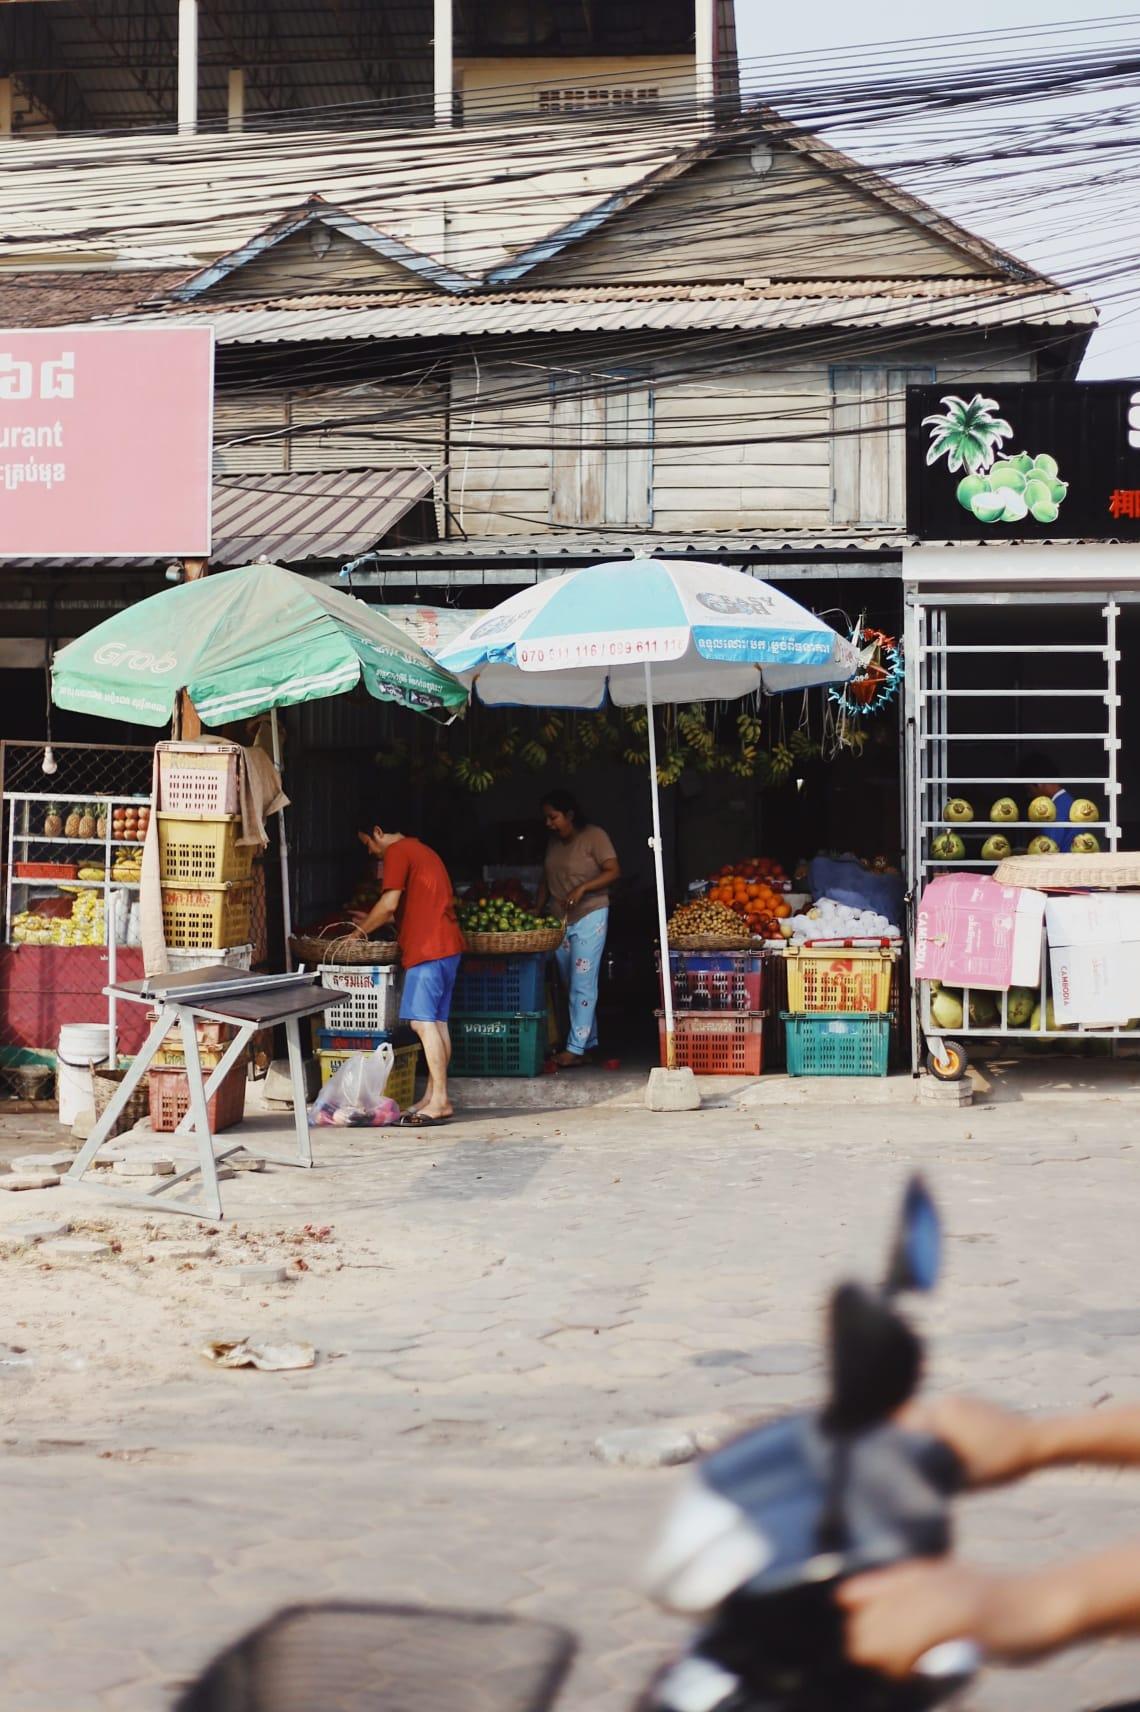 Volunteering in Siem Reap, Cambodia